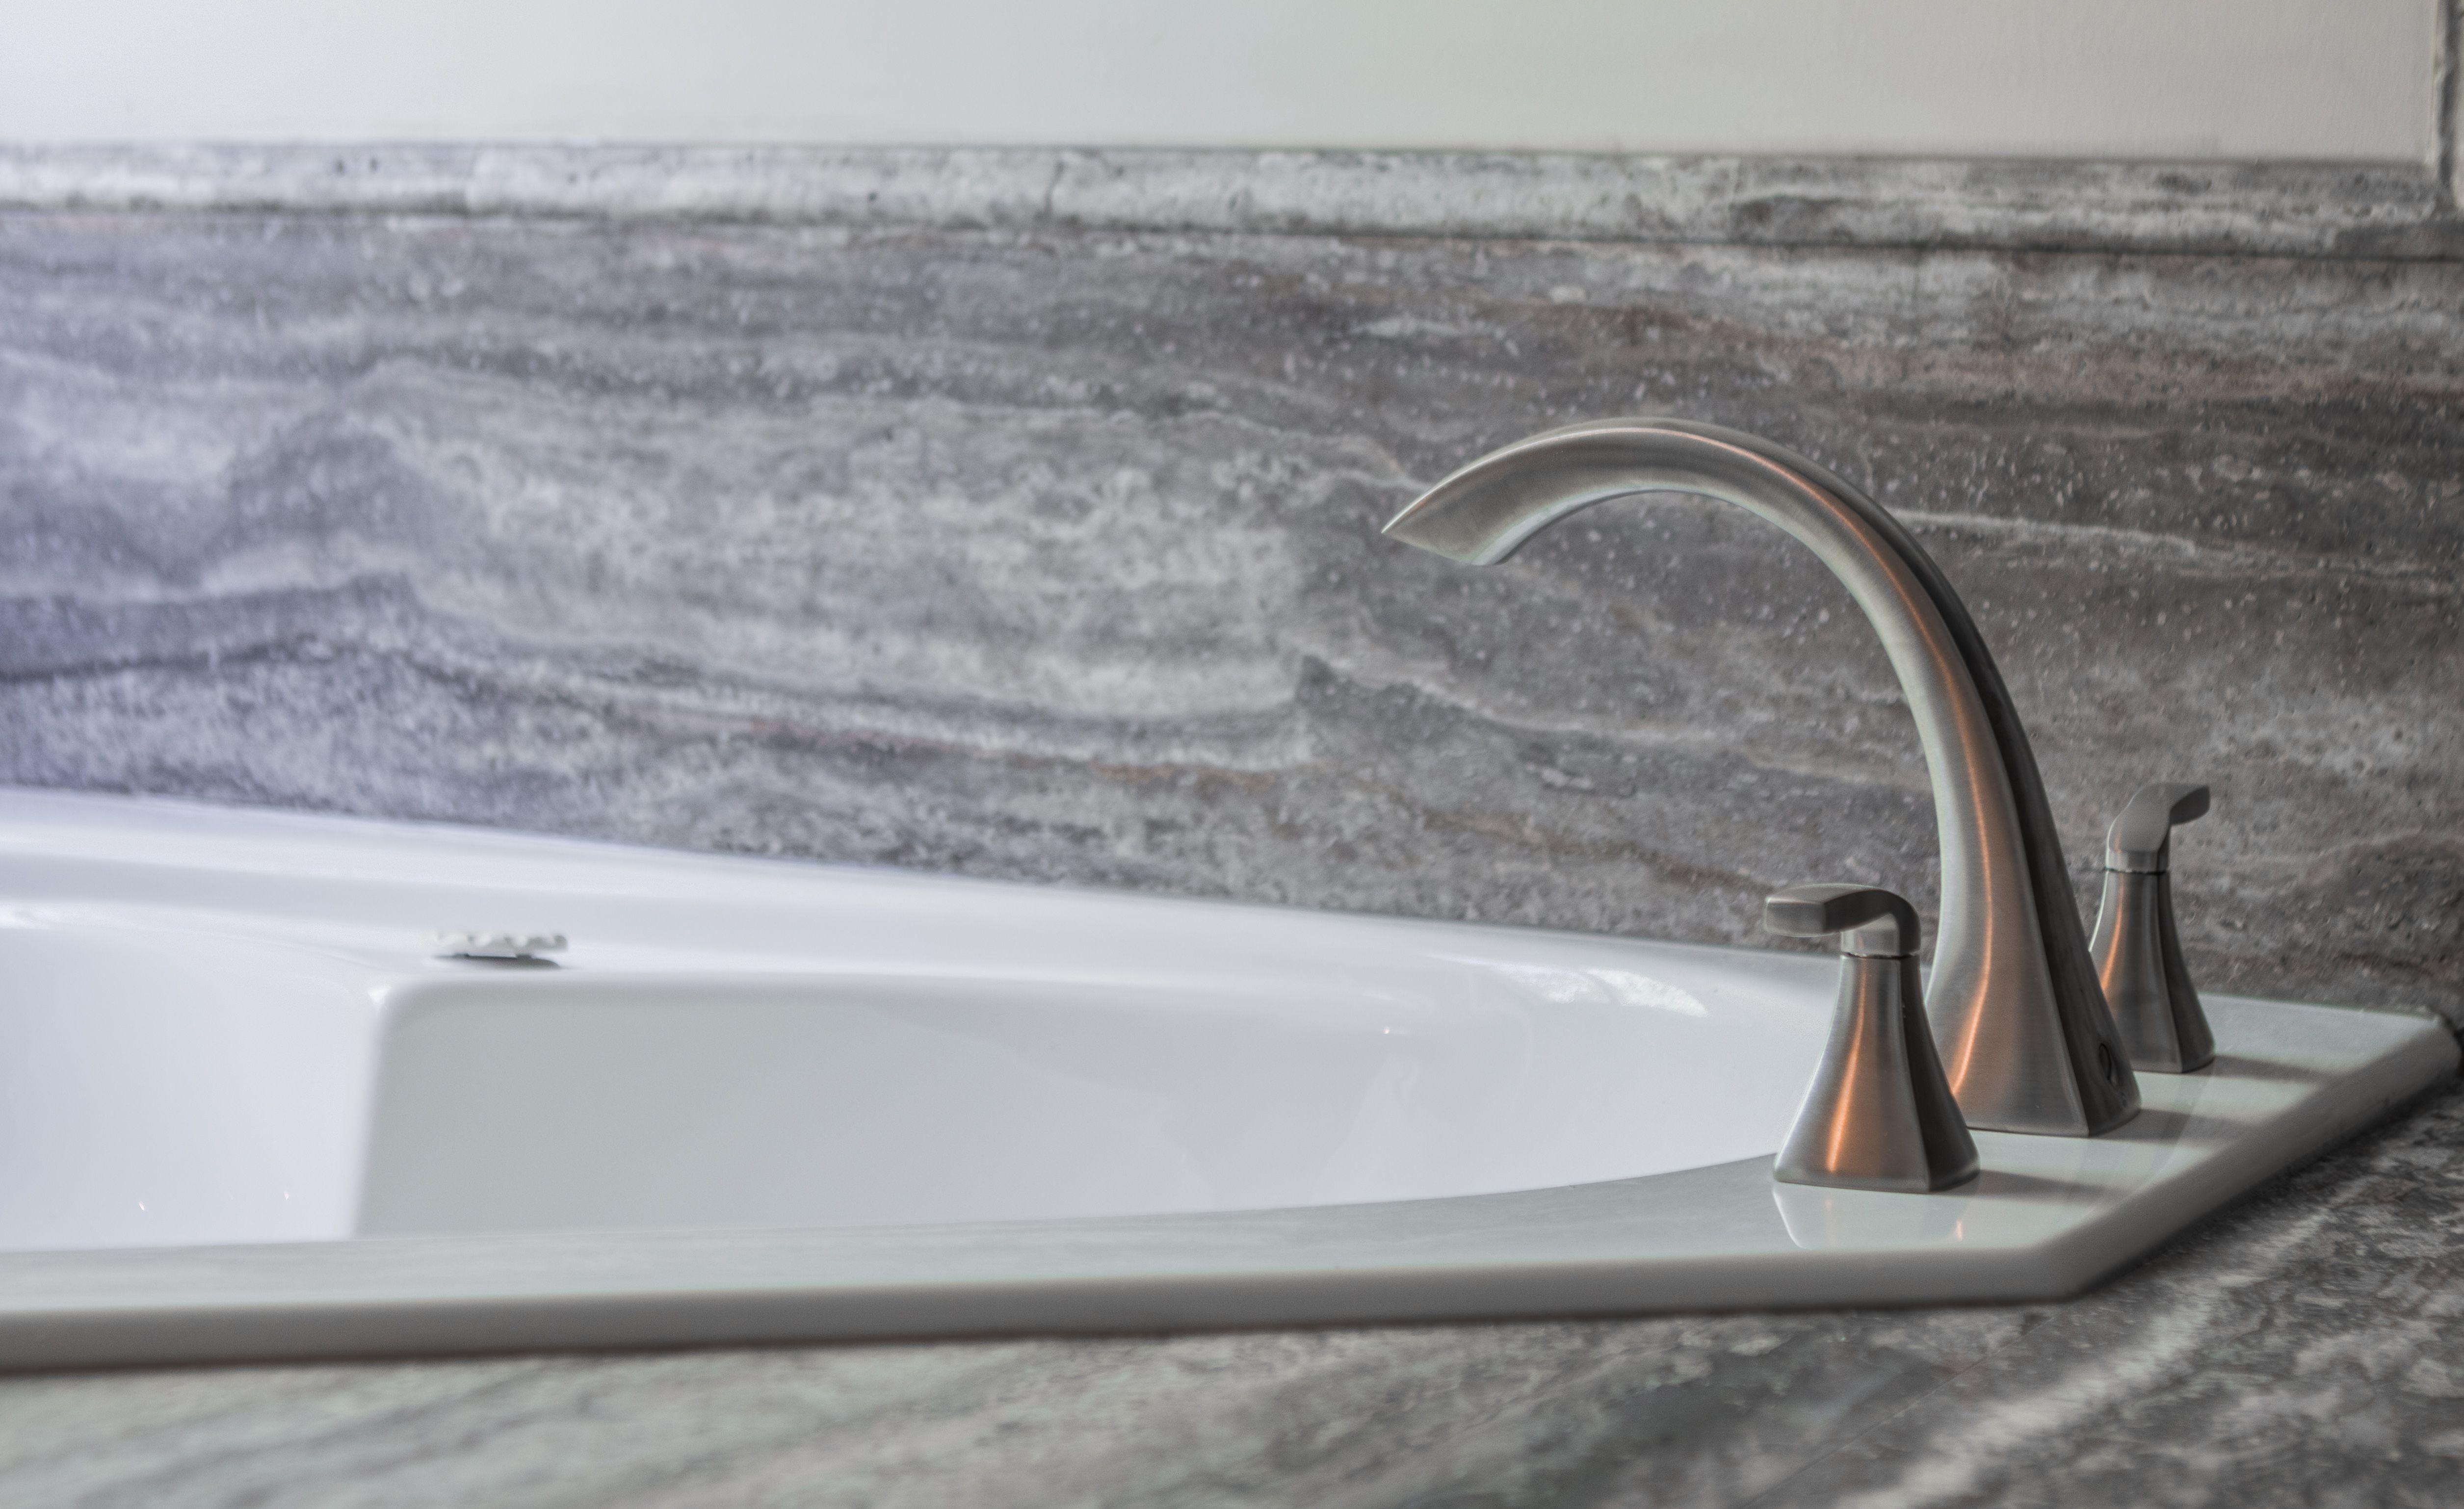 Jetted Soaking Tub With Natural Stone Slab Surround In Silver Vein Travertine Re Bath Durabath Natural Stone In Omaha Nebraska Bath Omaha Soaking Tub [ 3076 x 5022 Pixel ]